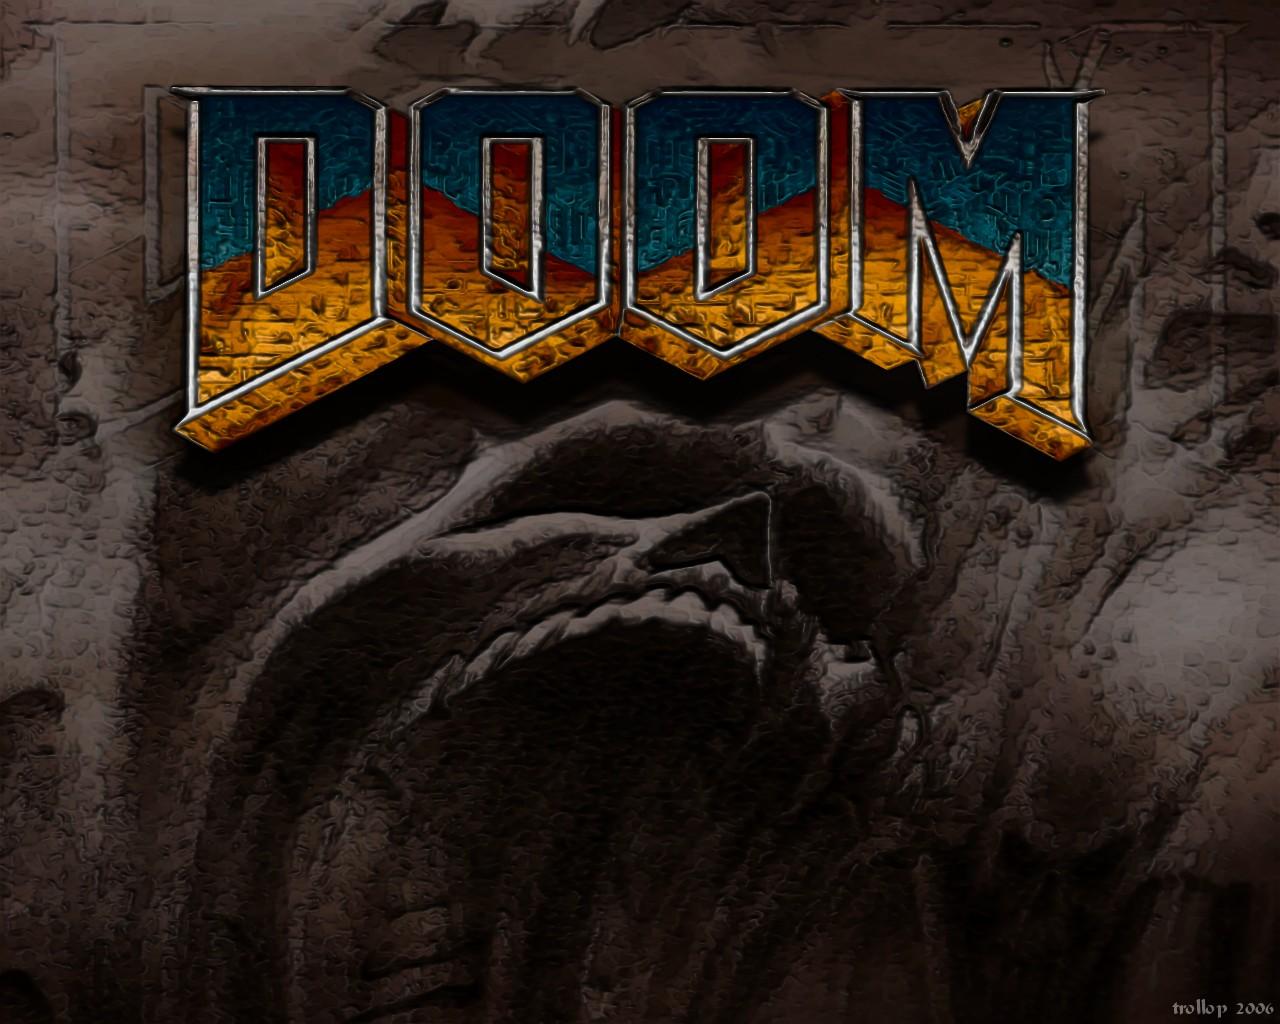 Doom Game Wallpaper 70 Images: Doom Collectors Edition Image